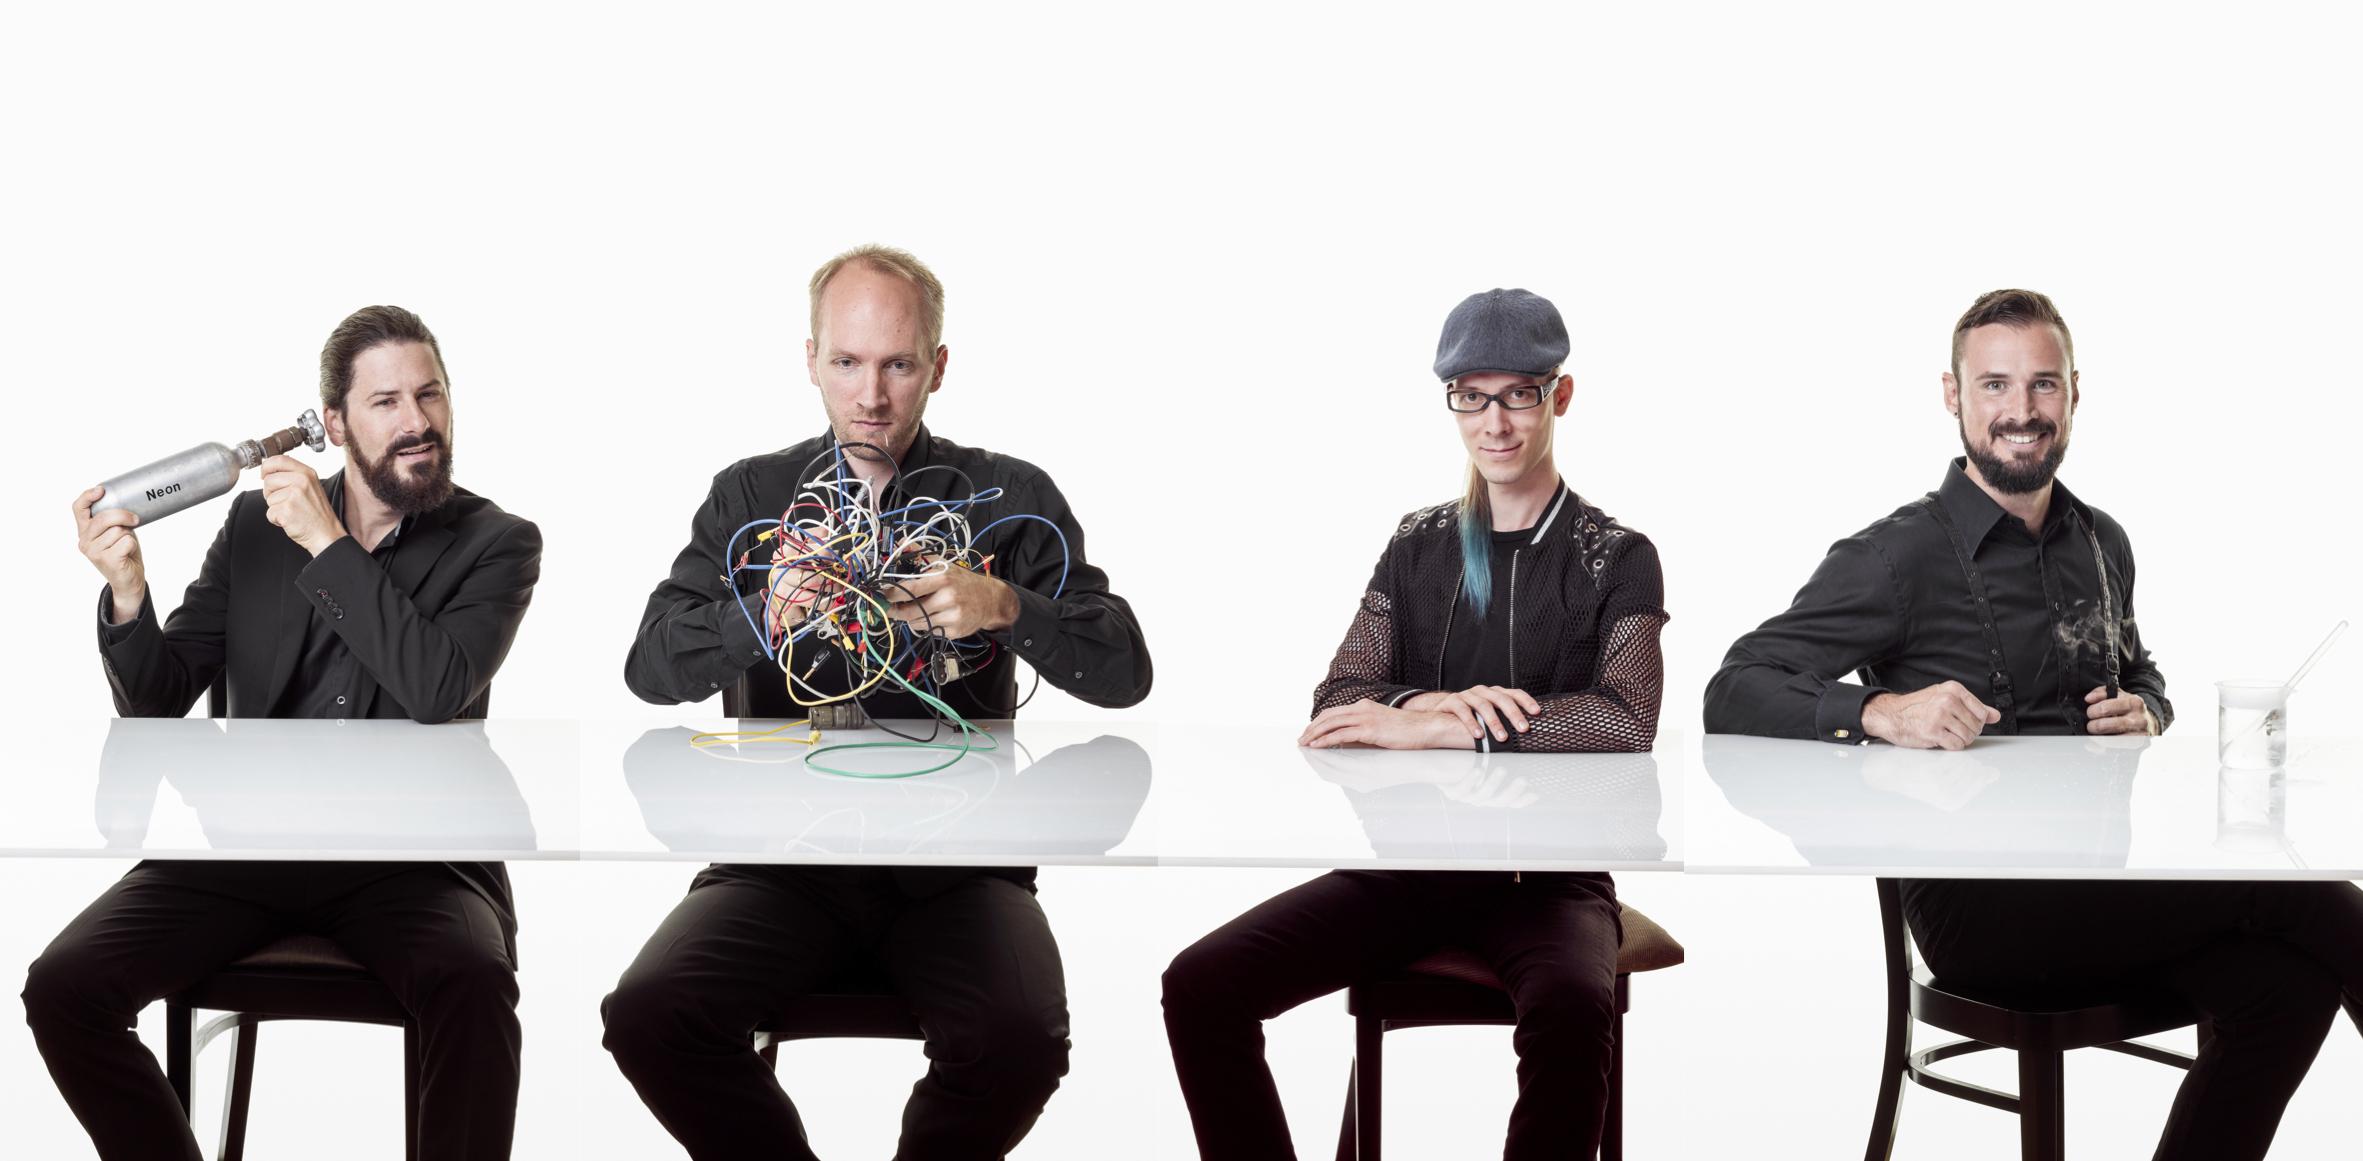 ensemble proton bern – click & faun team